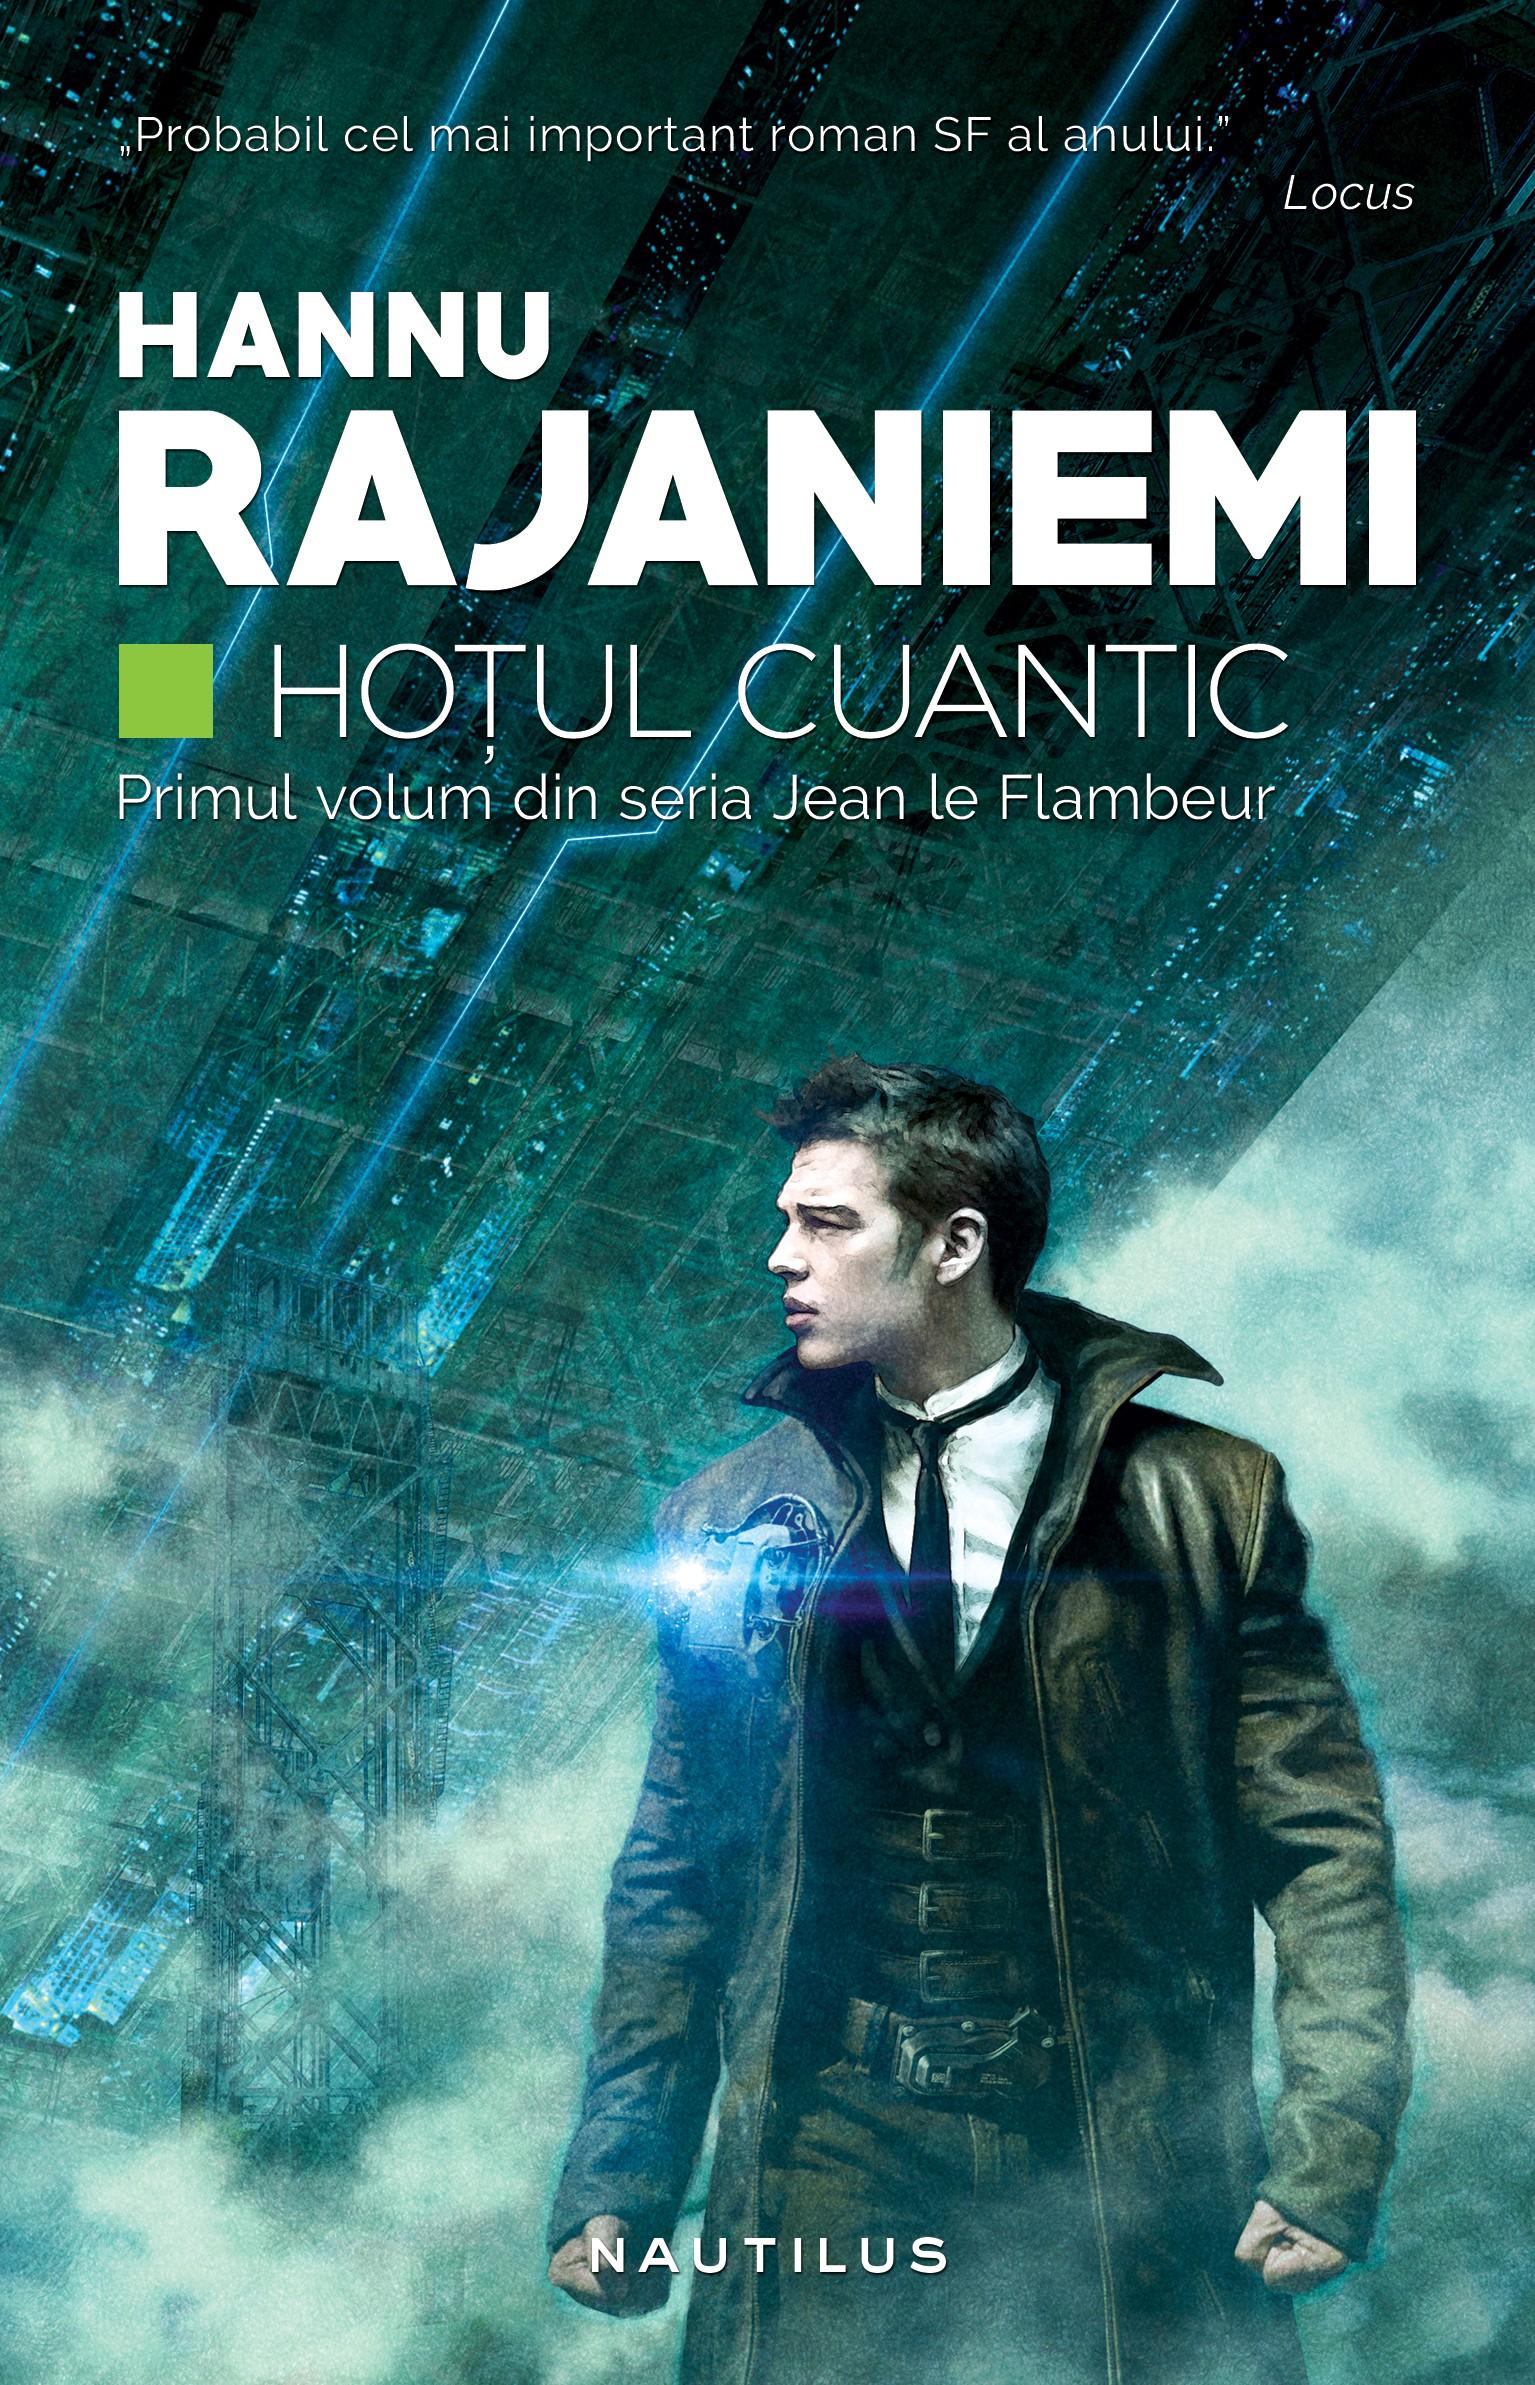 hannu-rajaniemi—hotul-cuantic-c1